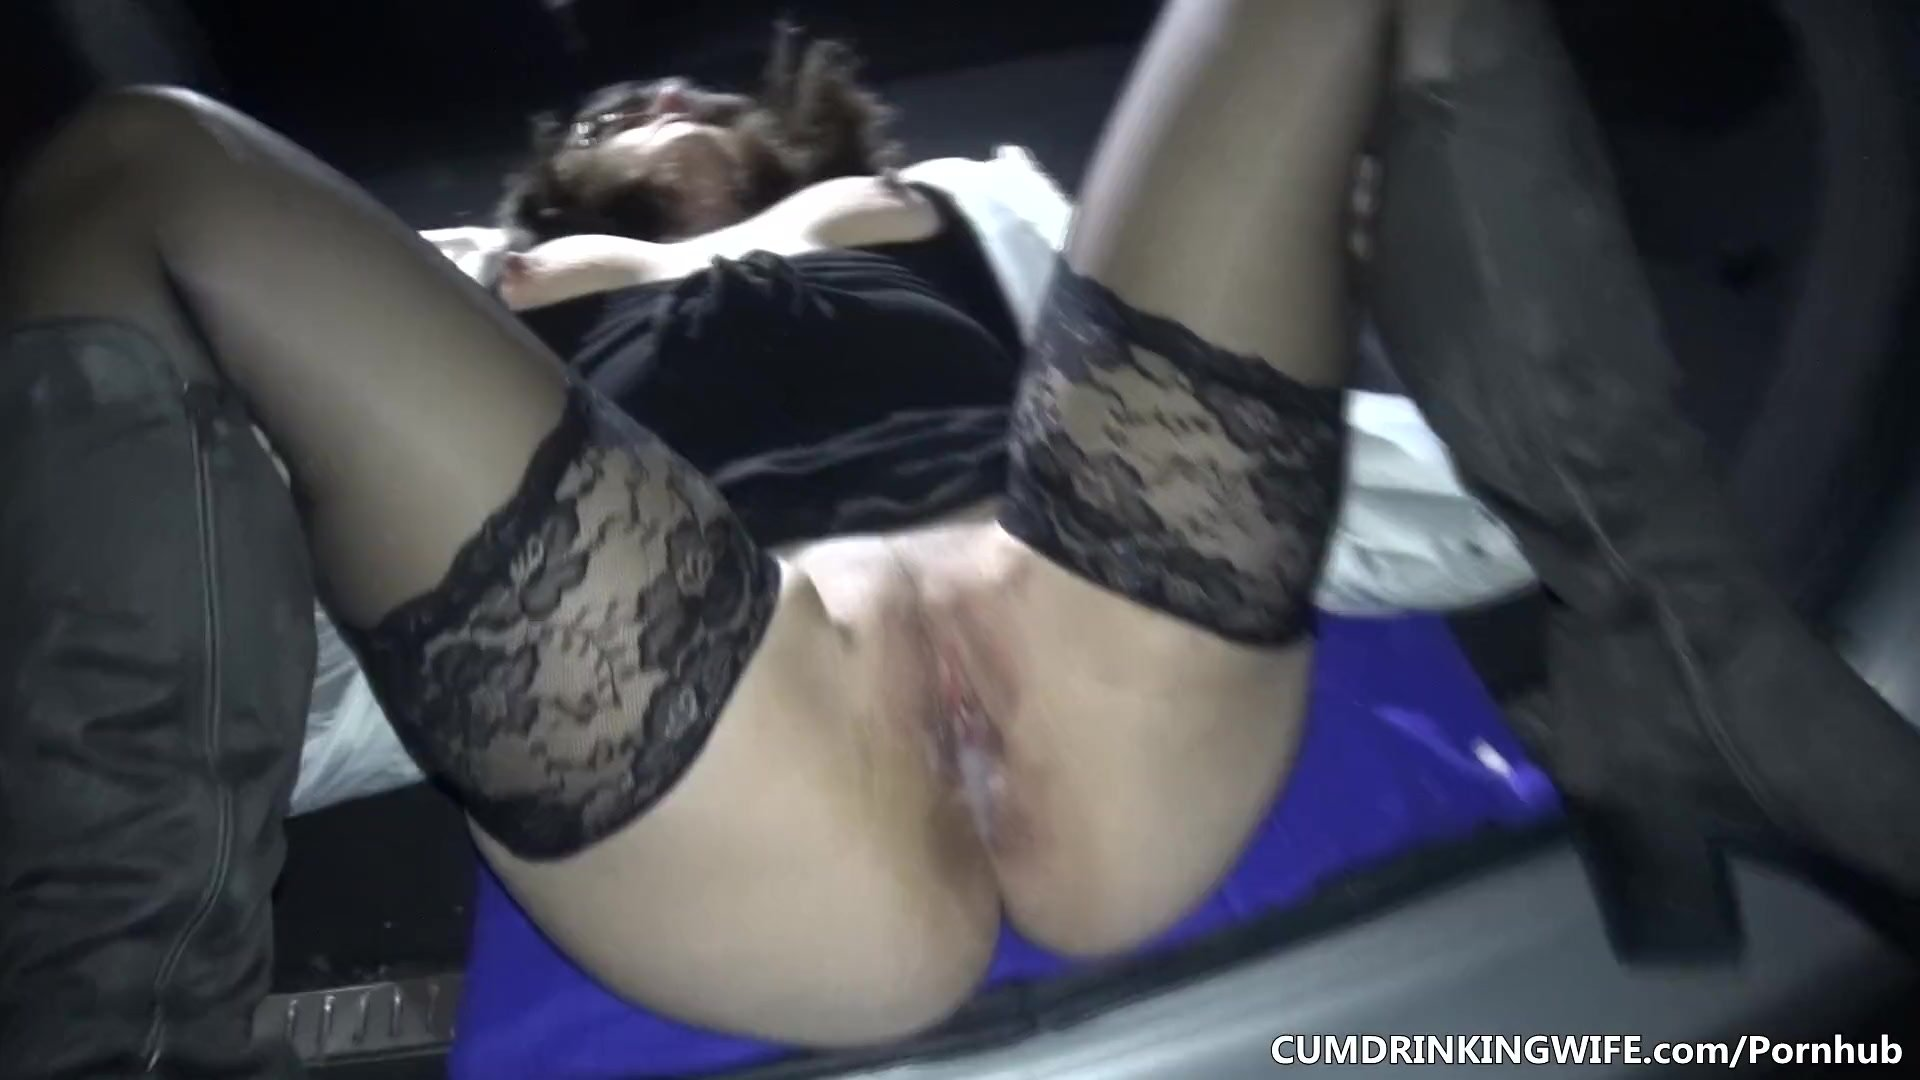 Public/cumdrinkingwife/in her strangers by car